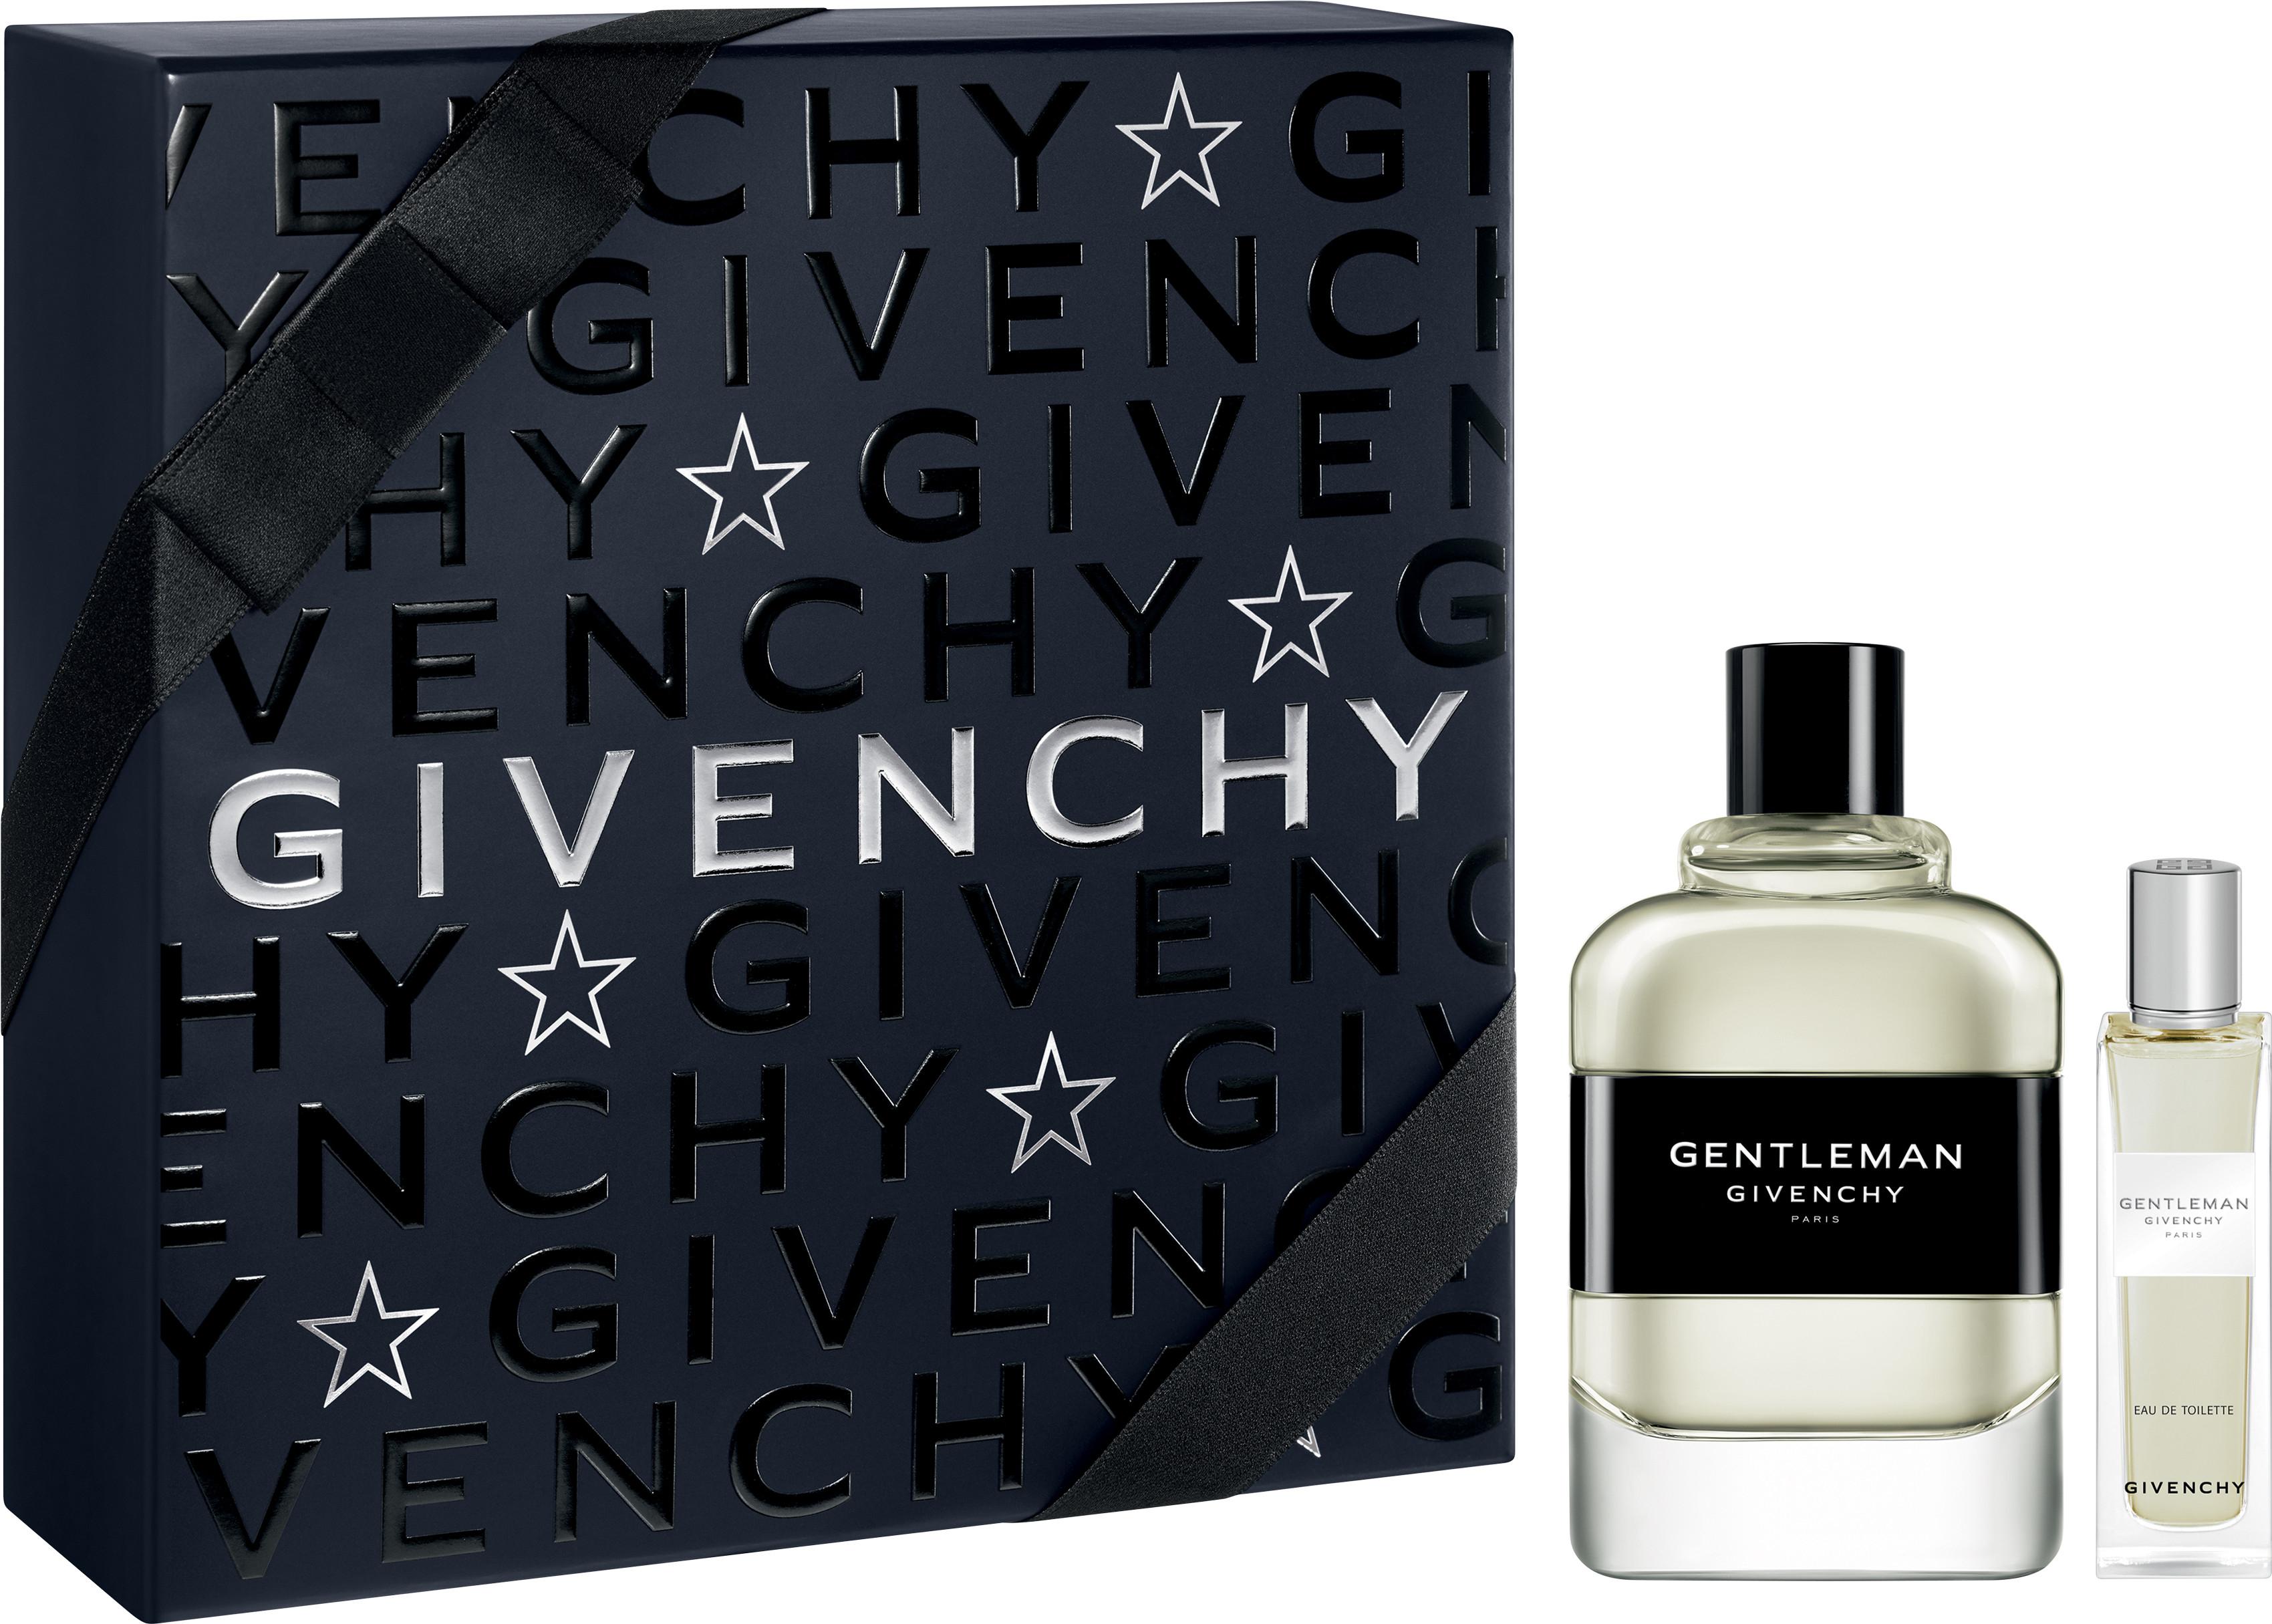 GIVENCHY Gentleman Eau de Toilette Spray 100ml Gift Set £39.60/ 100ml Eau de Toilette Spray £35.20 @ Escentual - Code ESCENTUAL20